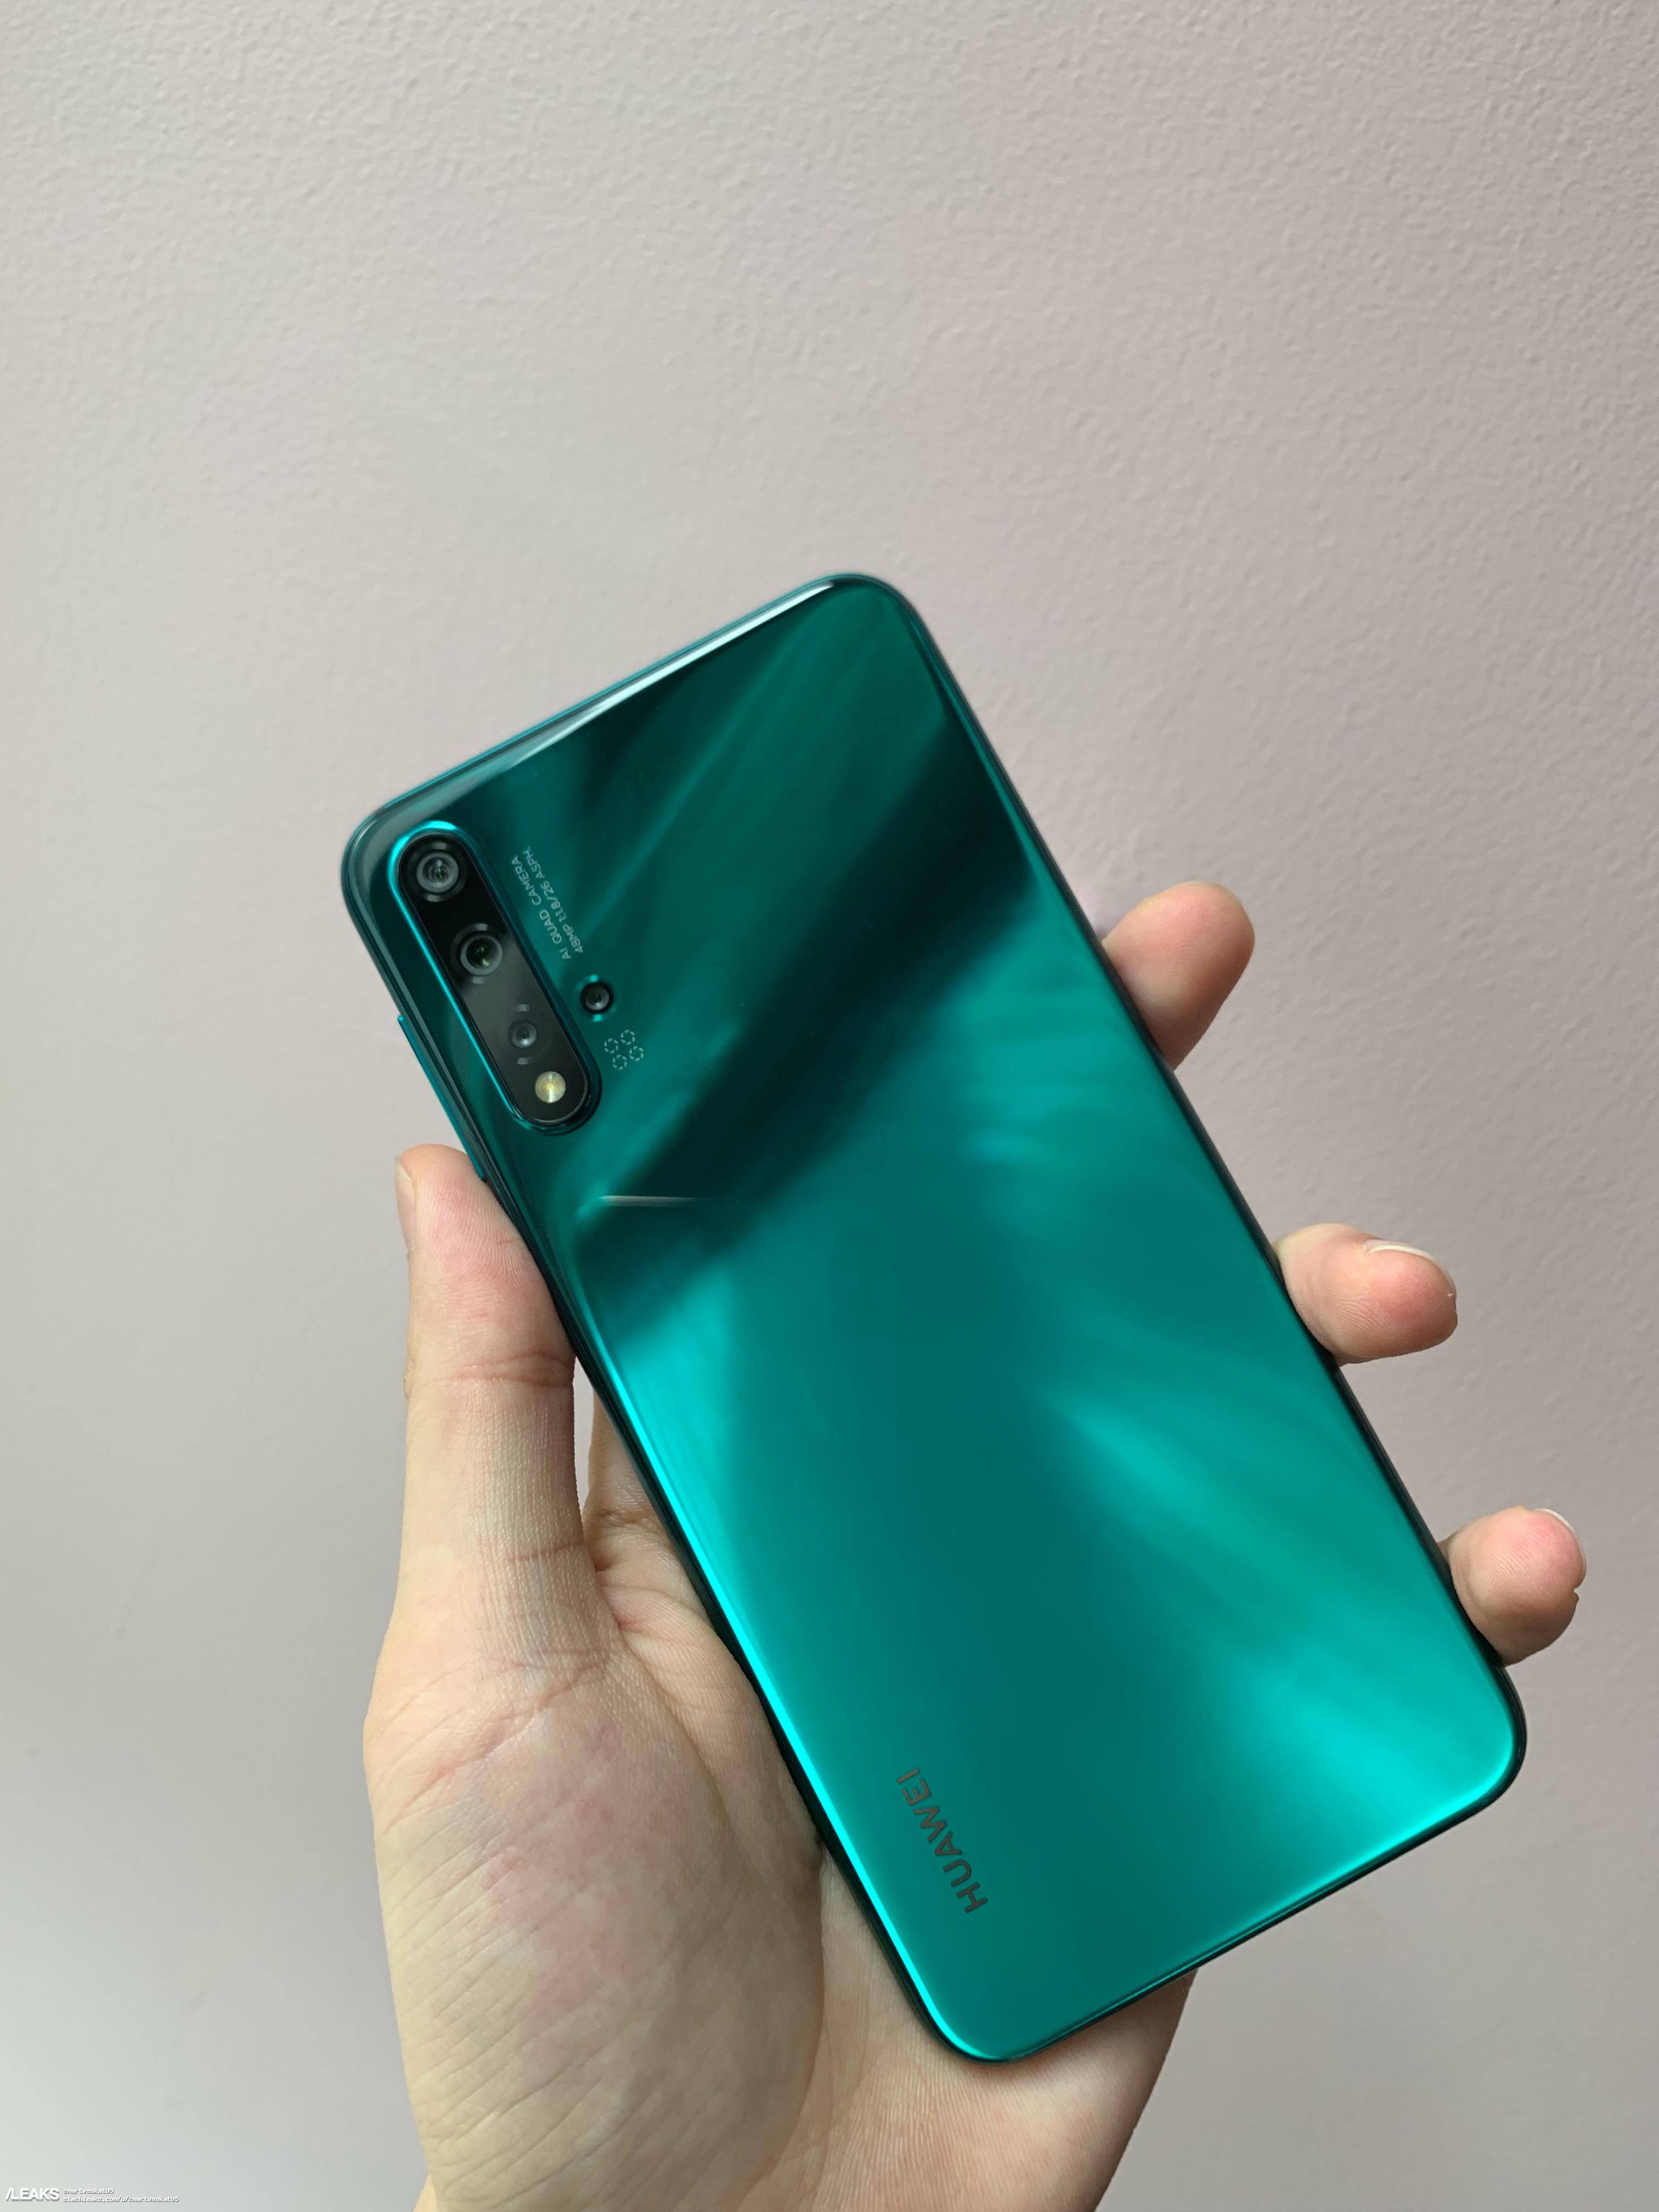 img More Huawei Nova 5 Pro Real Life Images Leaked